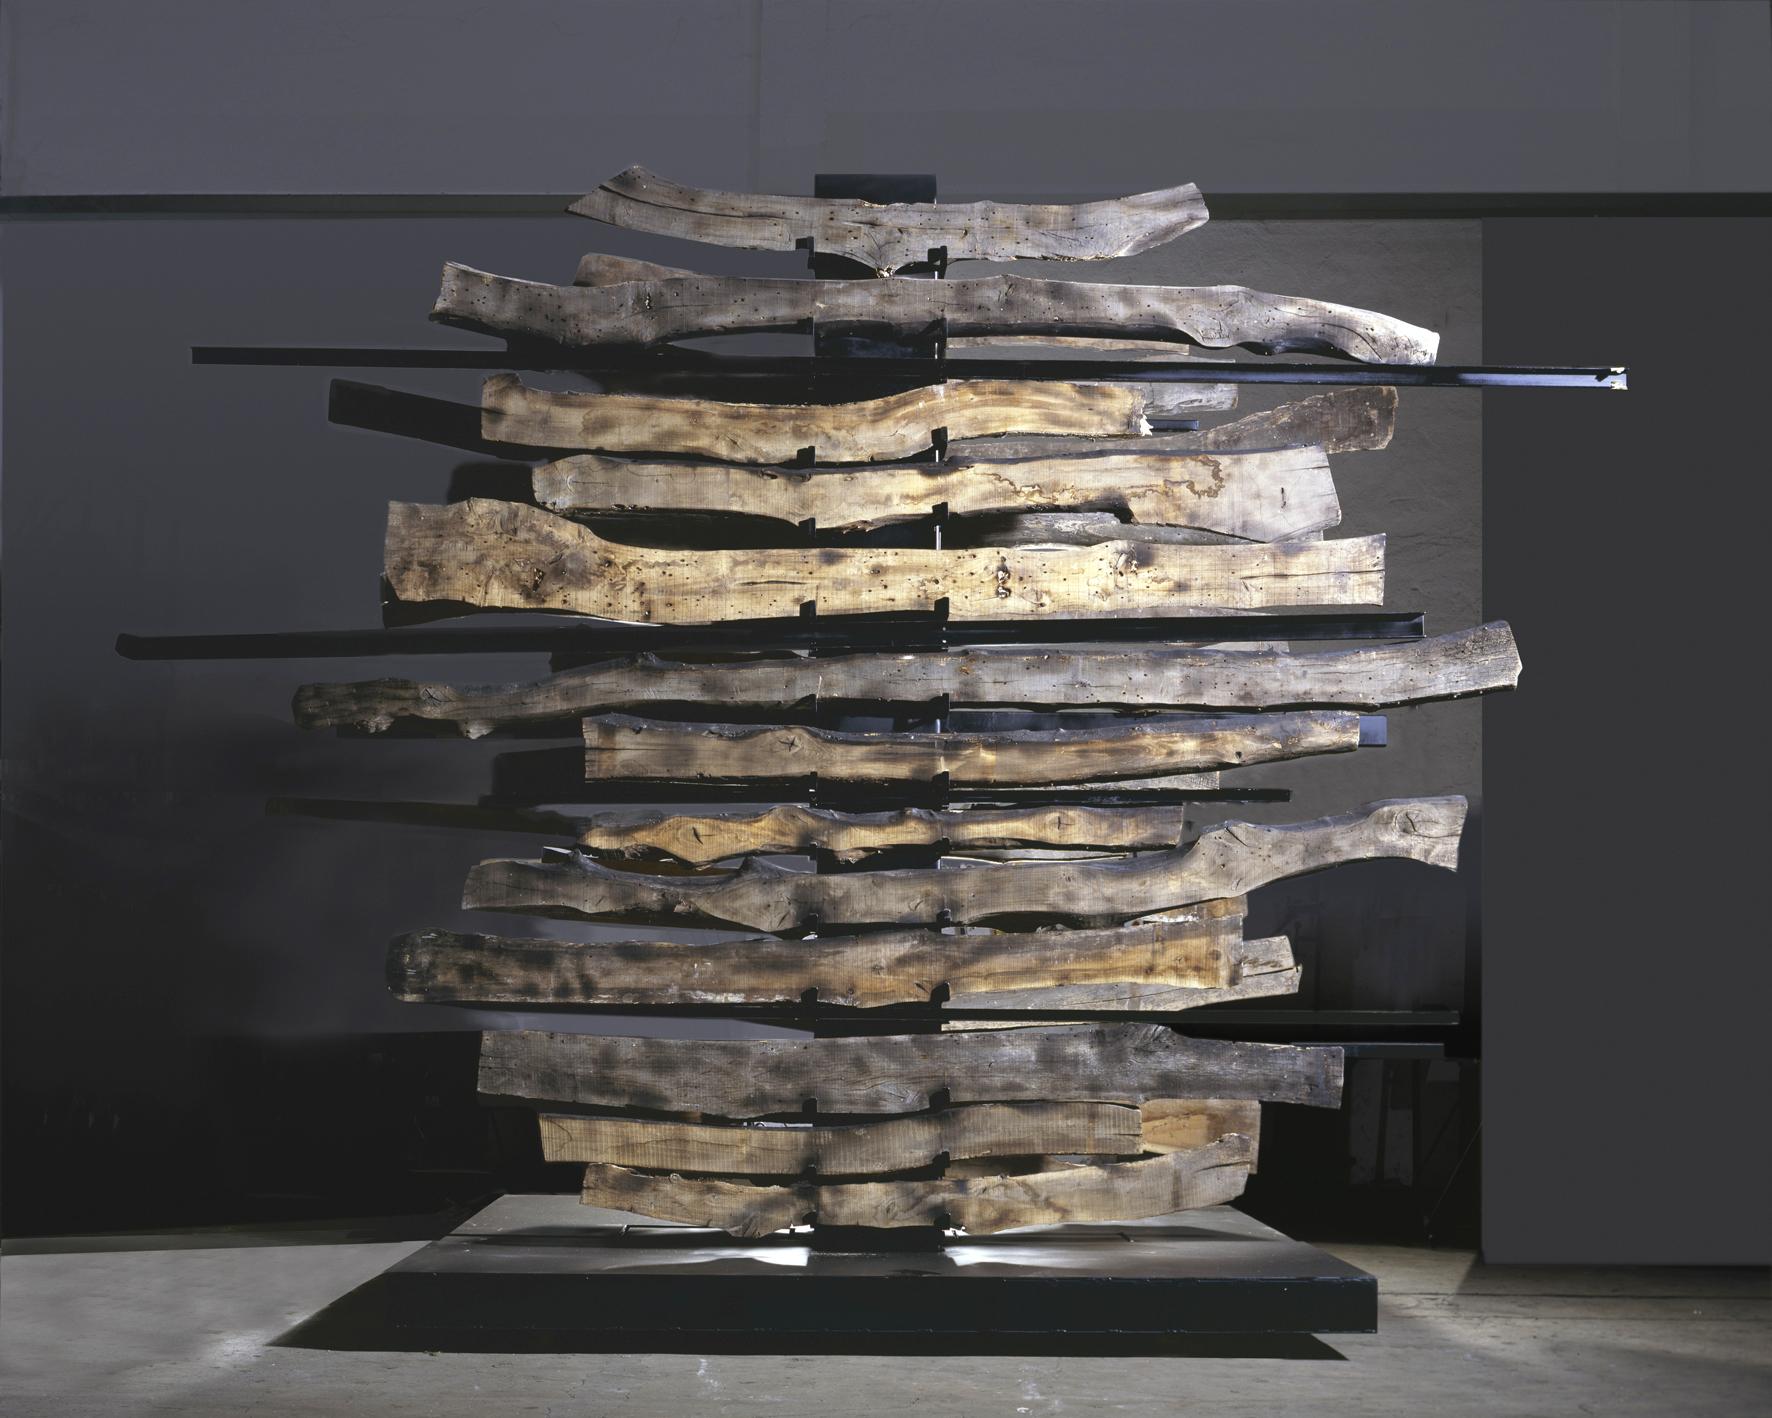 Maria Cristina Carlini, Samurai, 2013